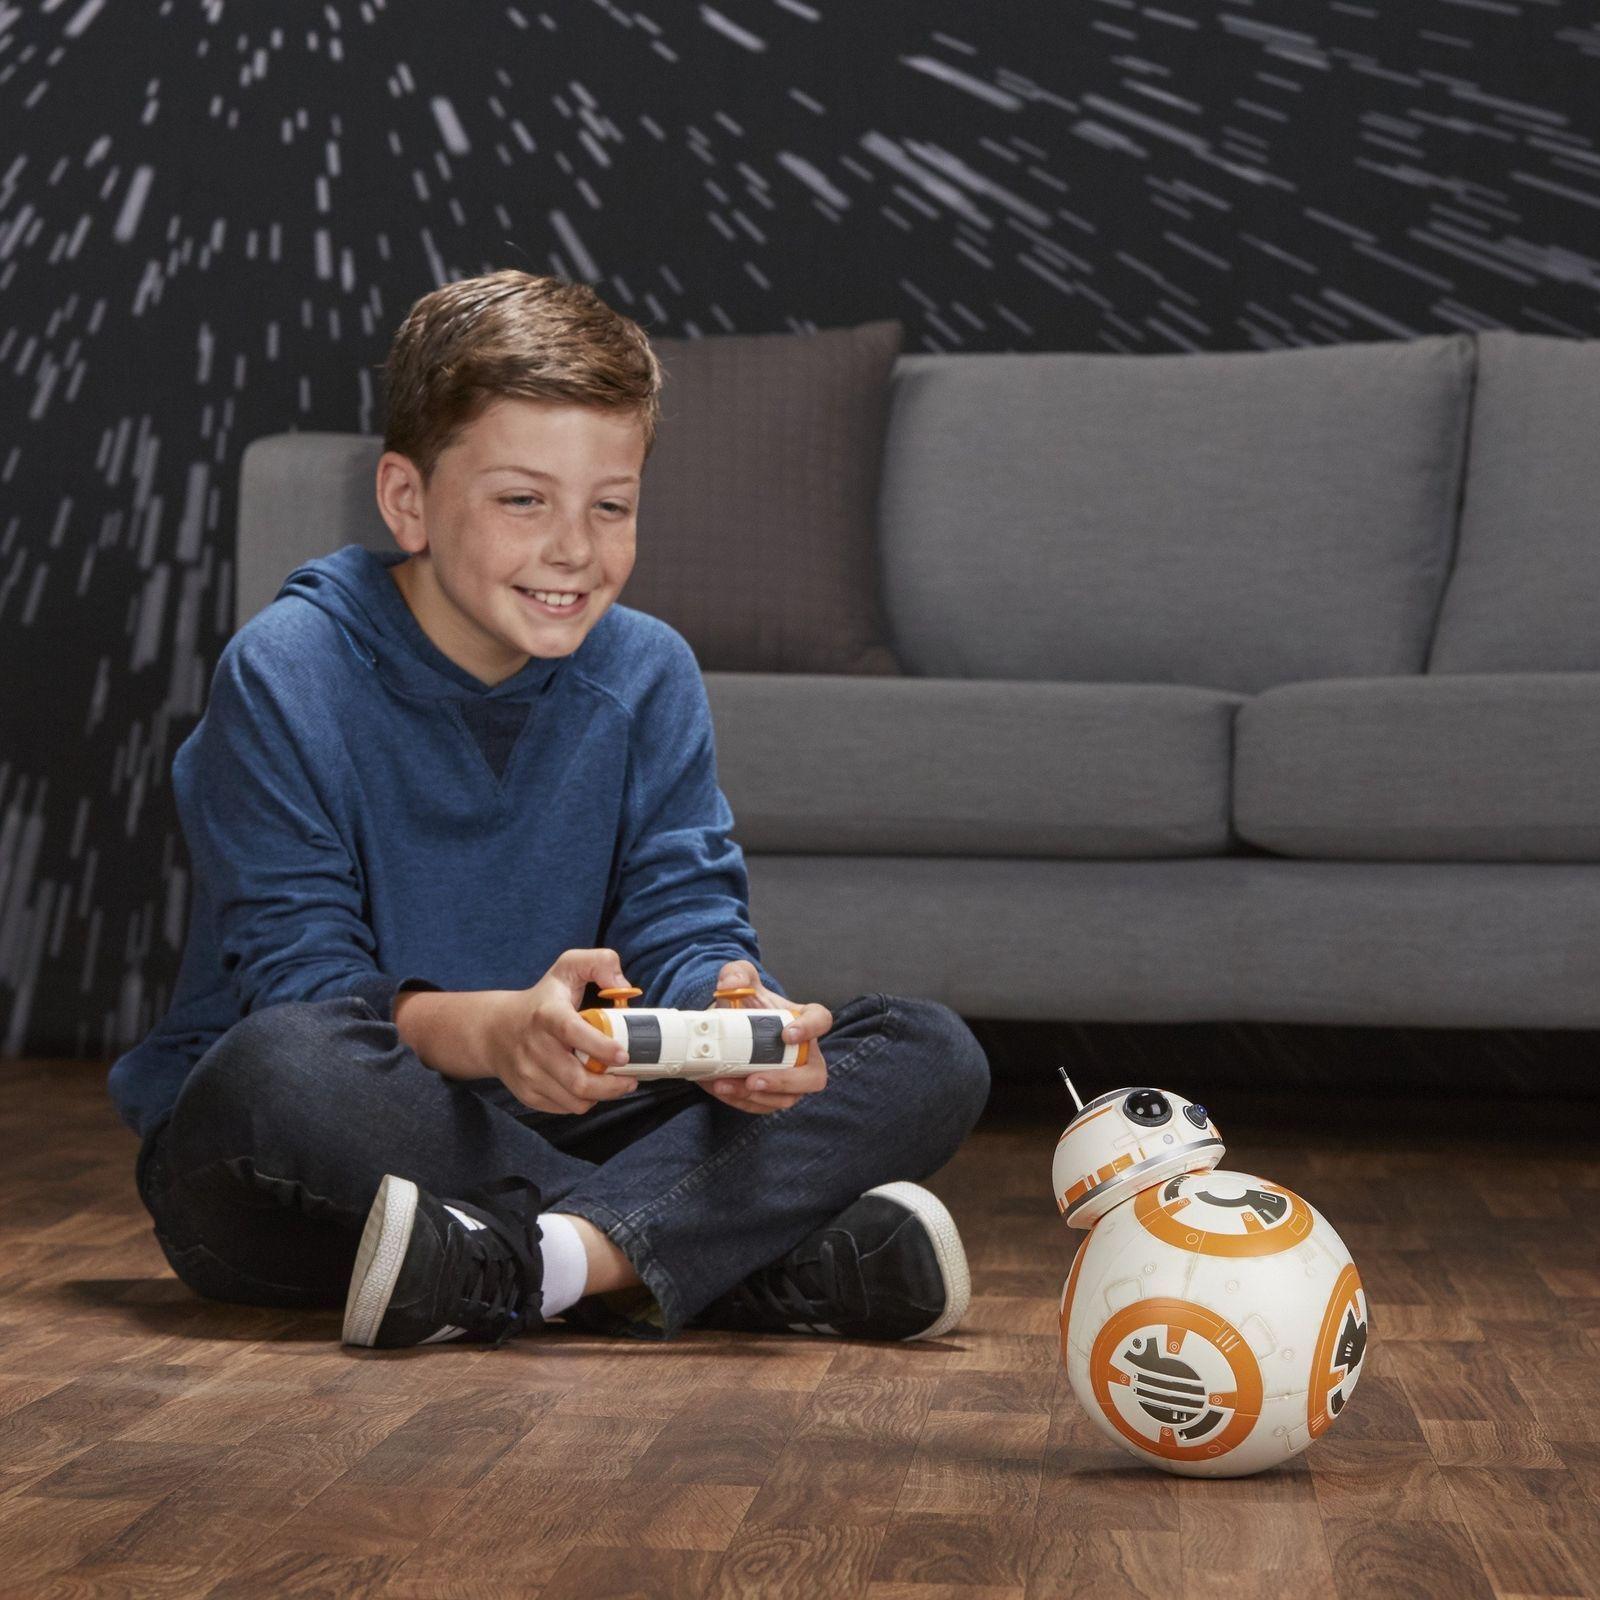 Star Wars  The Last Jedi Hyperdrive BB-8      BRAND NEW IN BOX